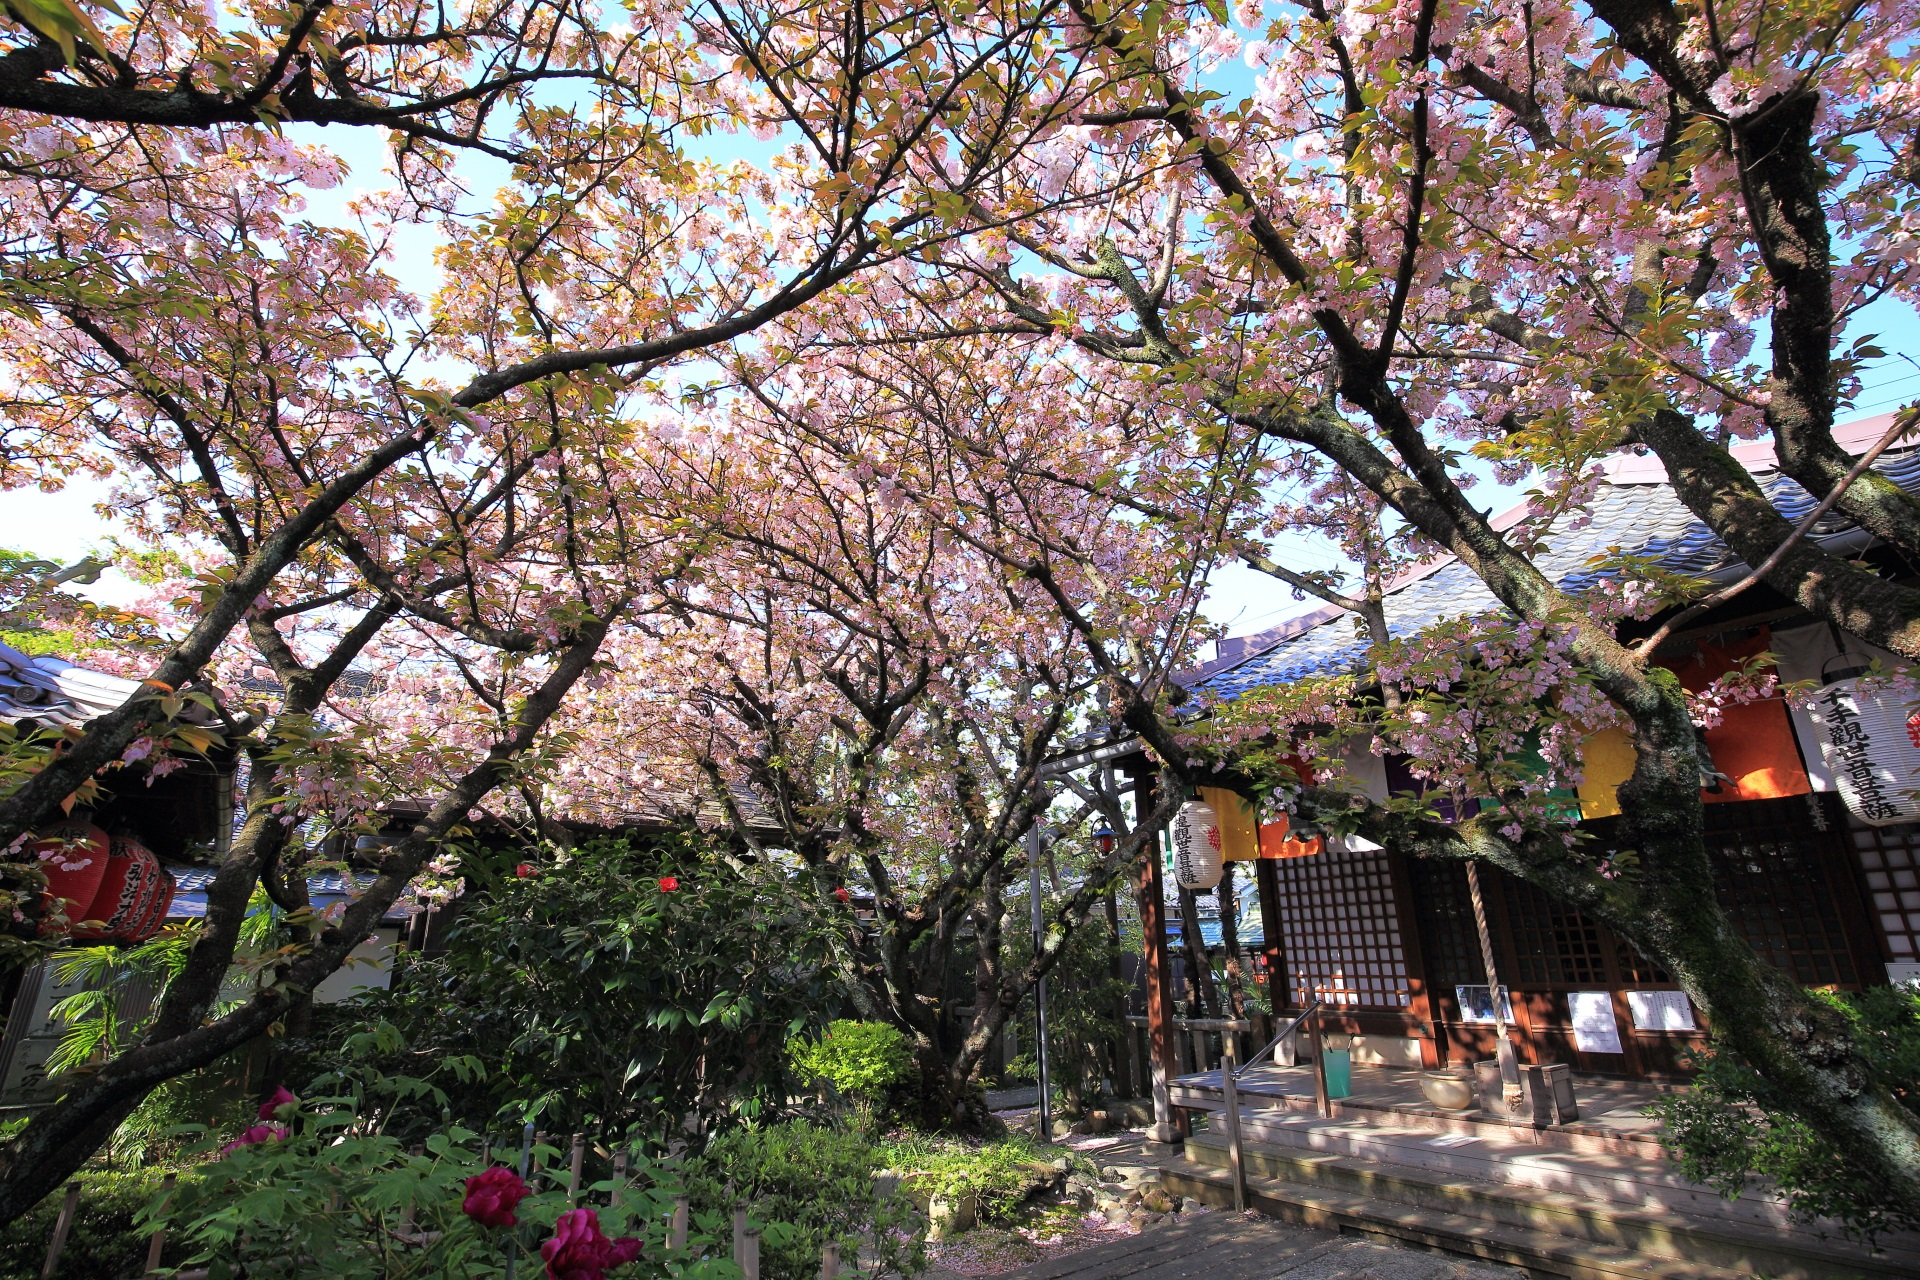 観音堂前の観音桜